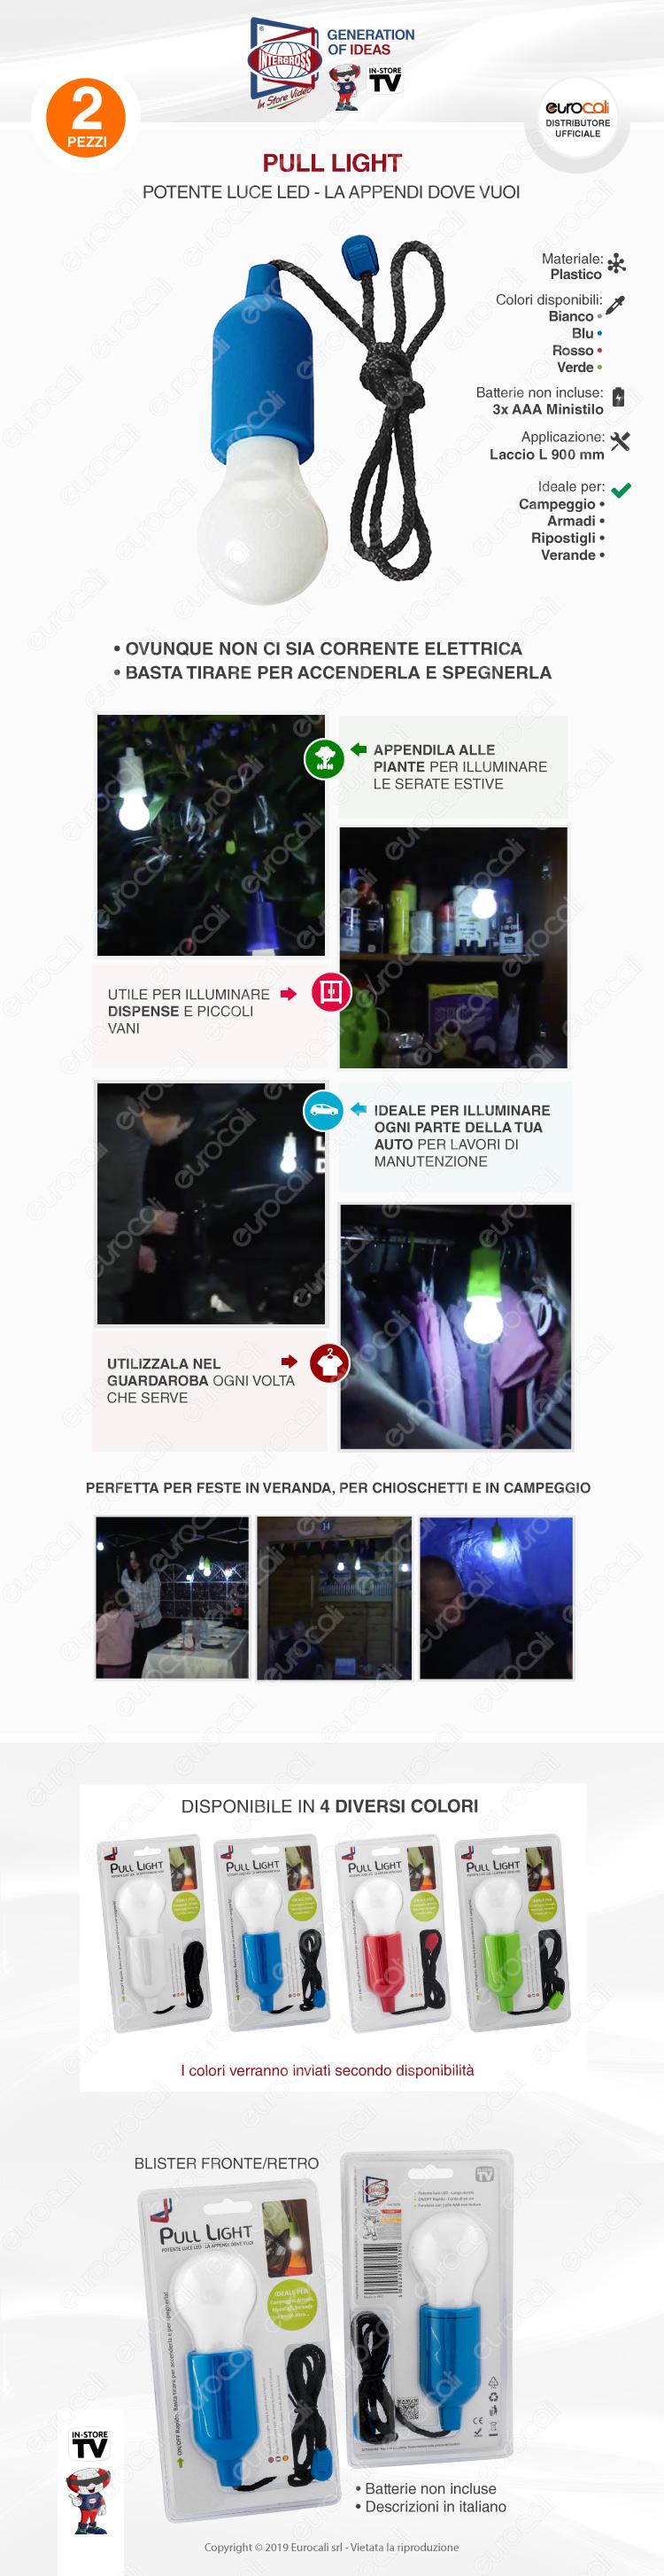 Kit 2 Intergross Pull Light Lampadina LED Senza Fili a Batteria da Appendere